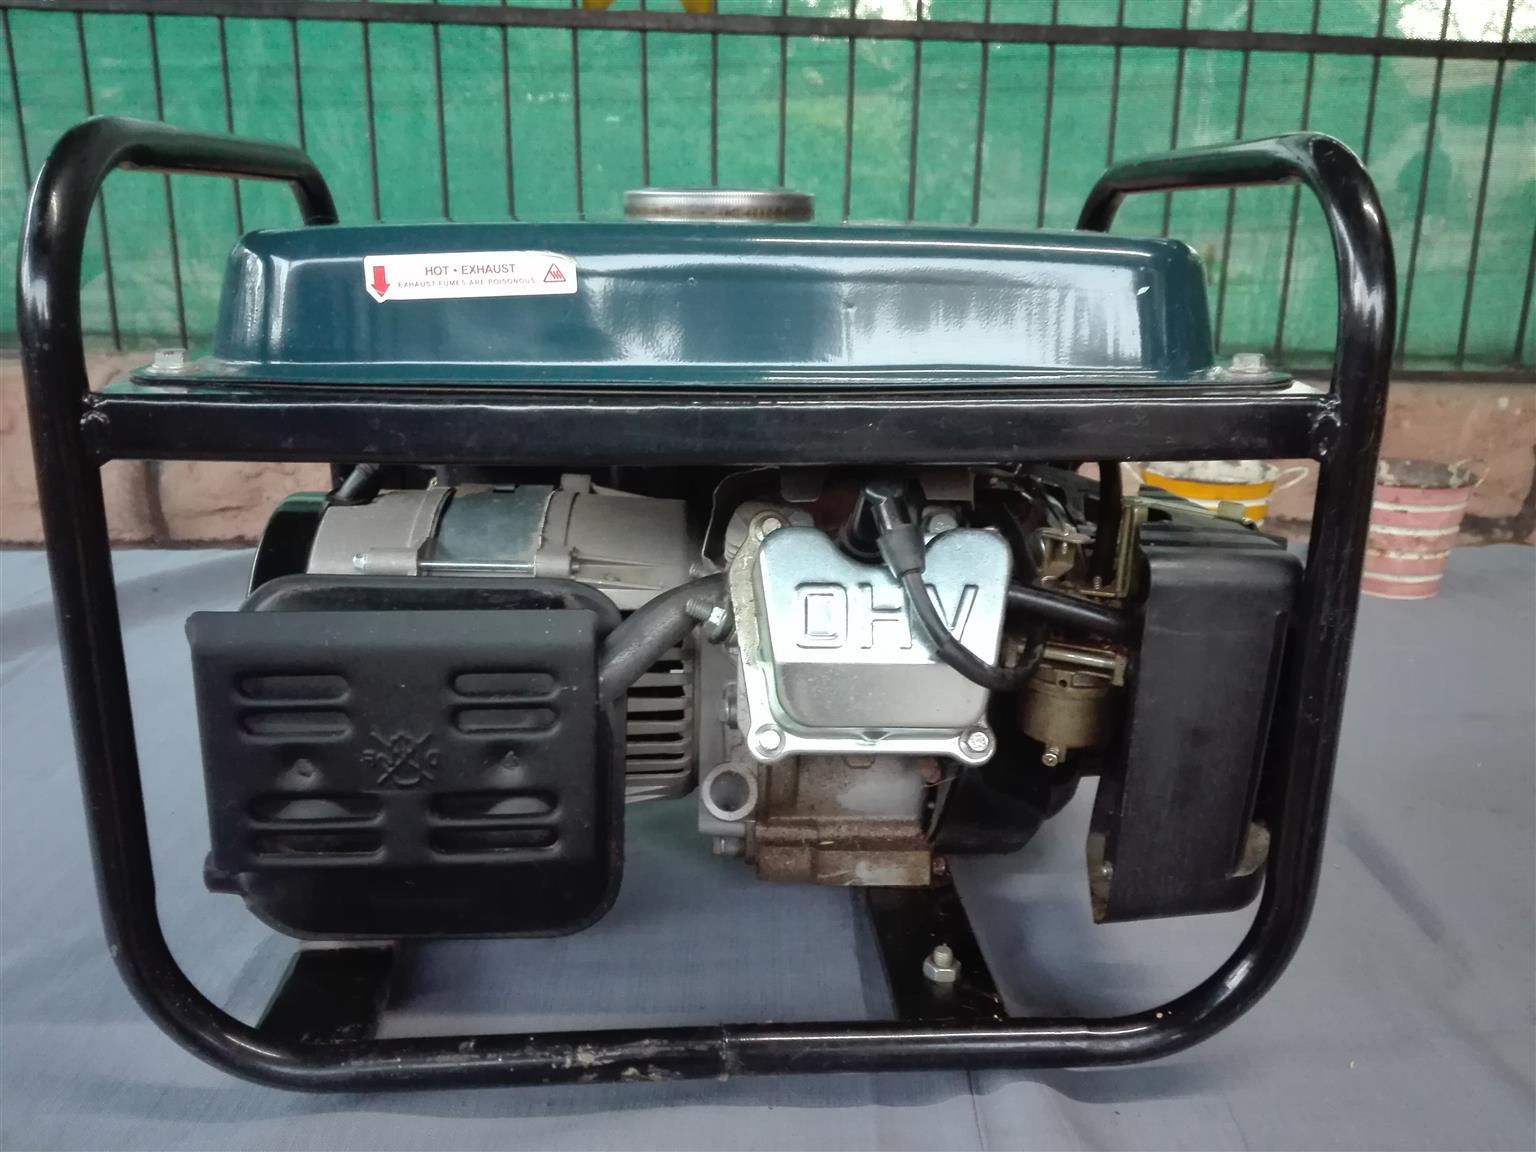 Stramm generator for sale